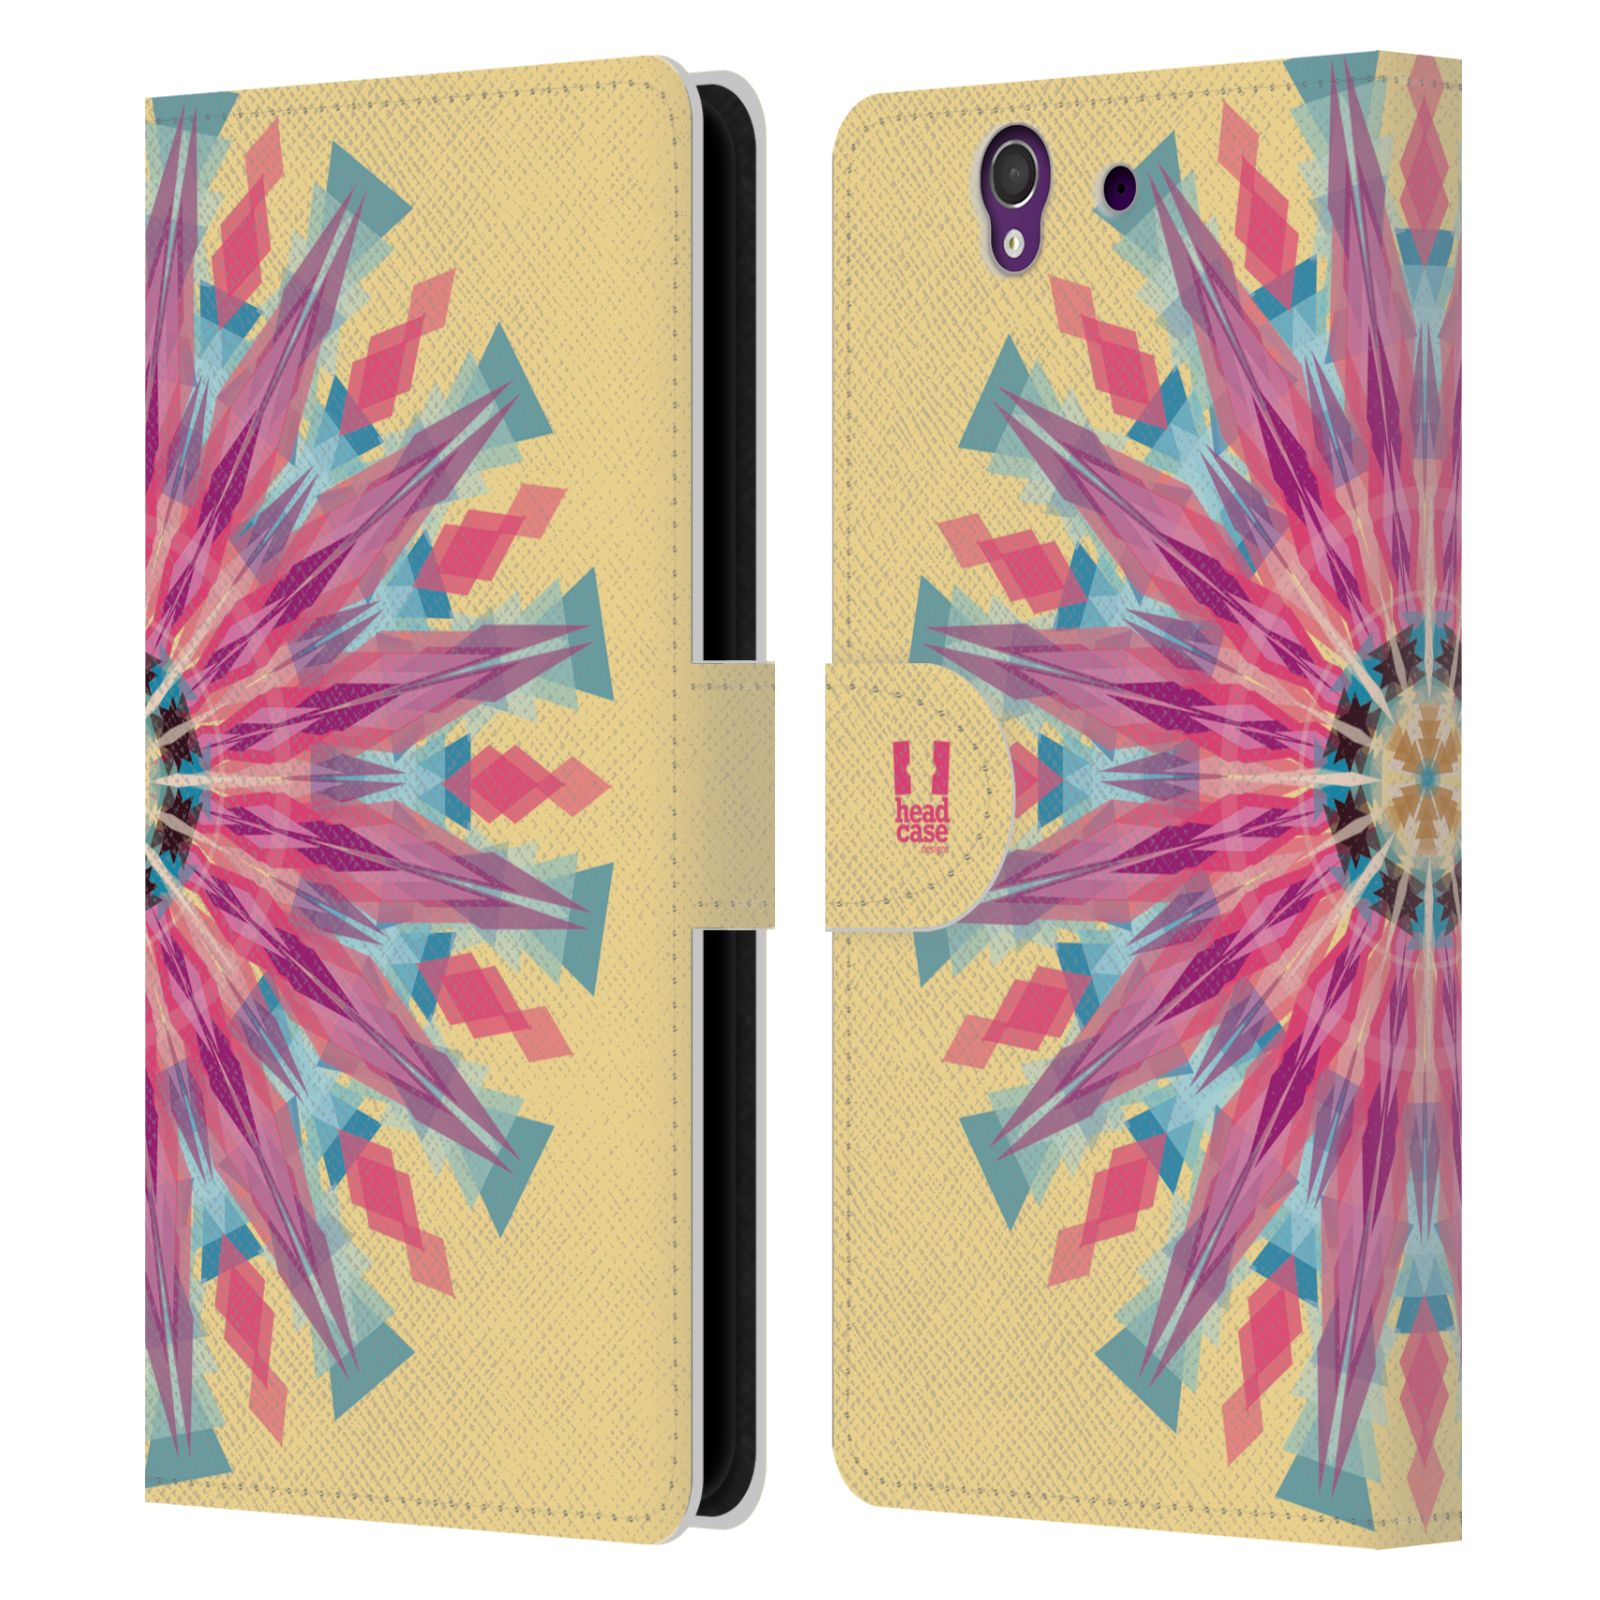 HEAD CASE Flipové pouzdro pro mobil SONY XPERIA Z (C6603) kaleidoskop mandala růžová barva slunce